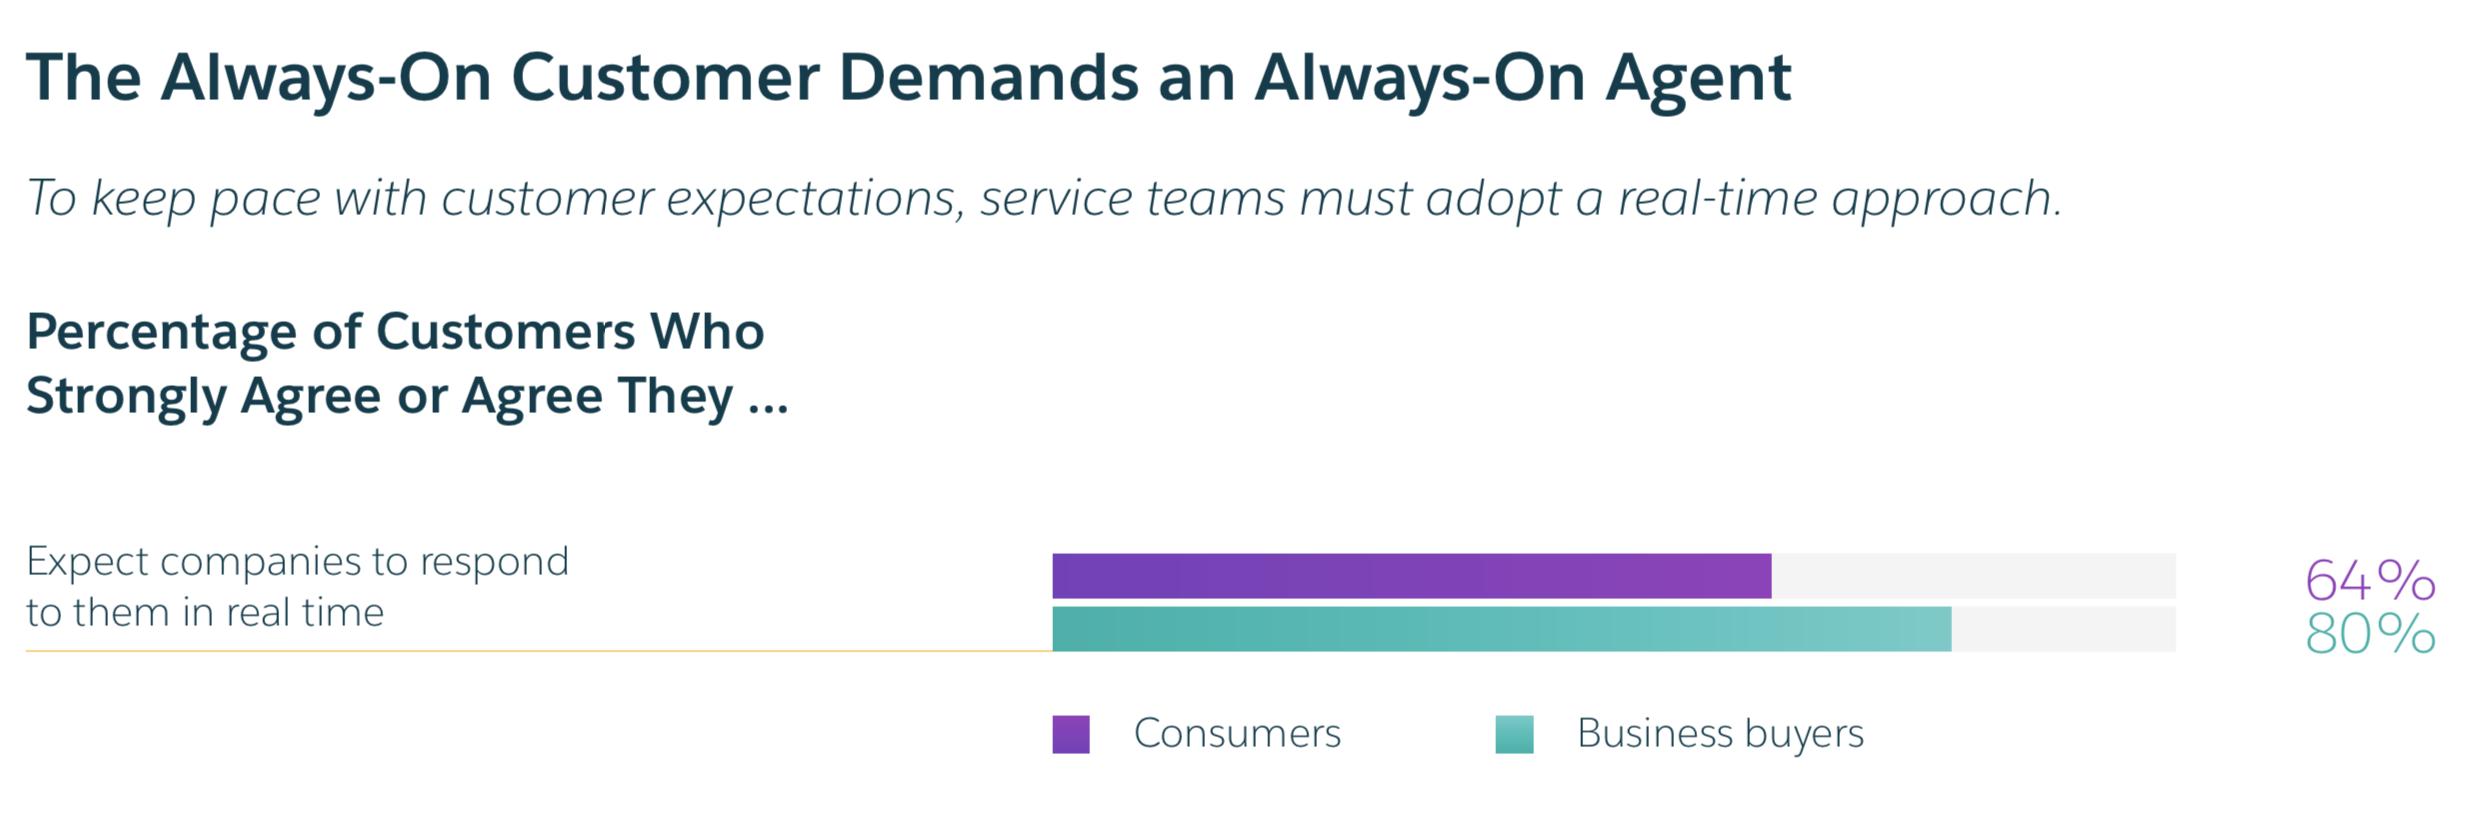 always-on-customer-agent